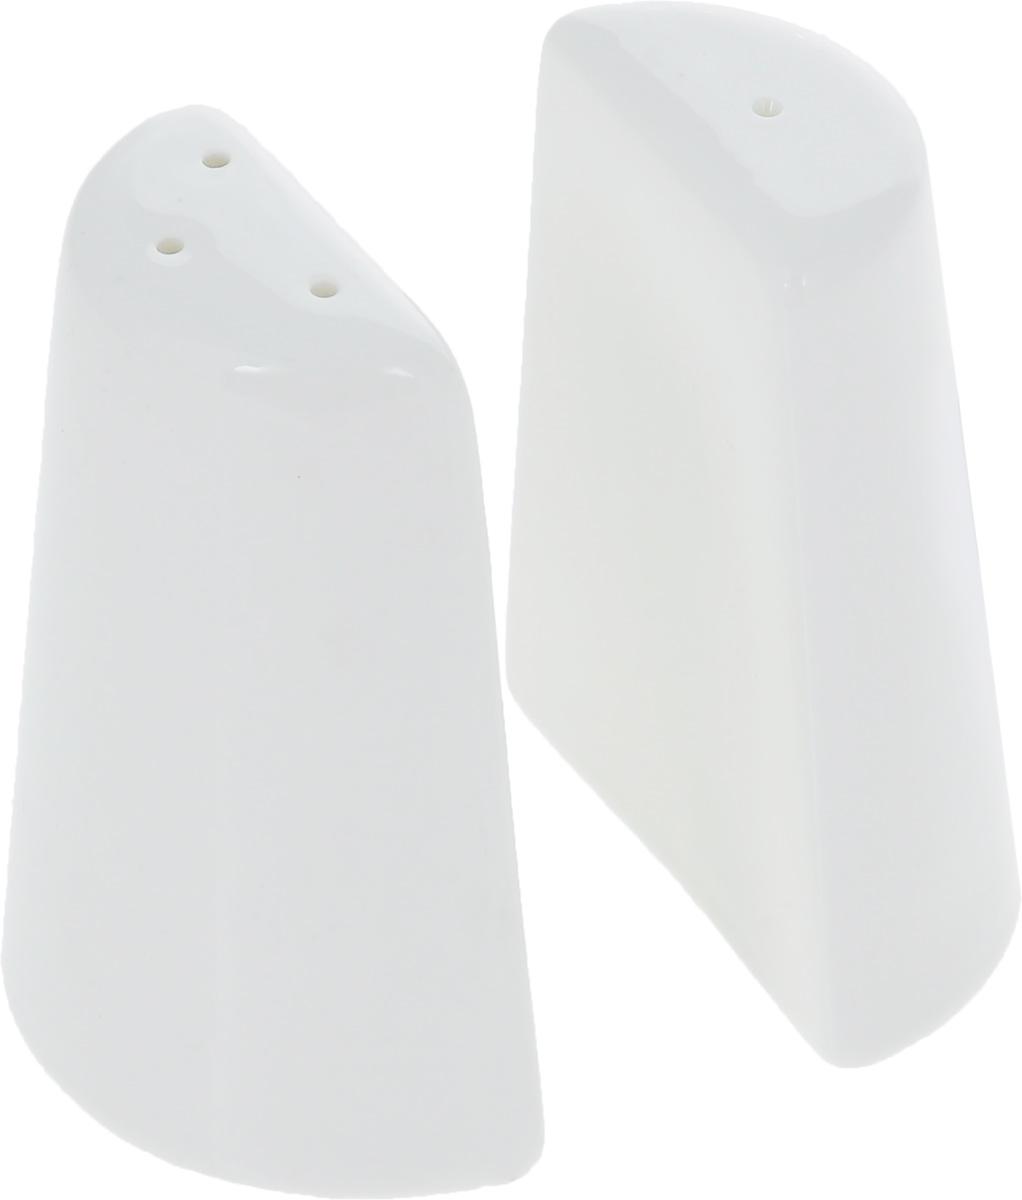 Набор для специй Wilmax, 2 предмета. WL-996068 / SP набор для специй карамба утки 2 предмета